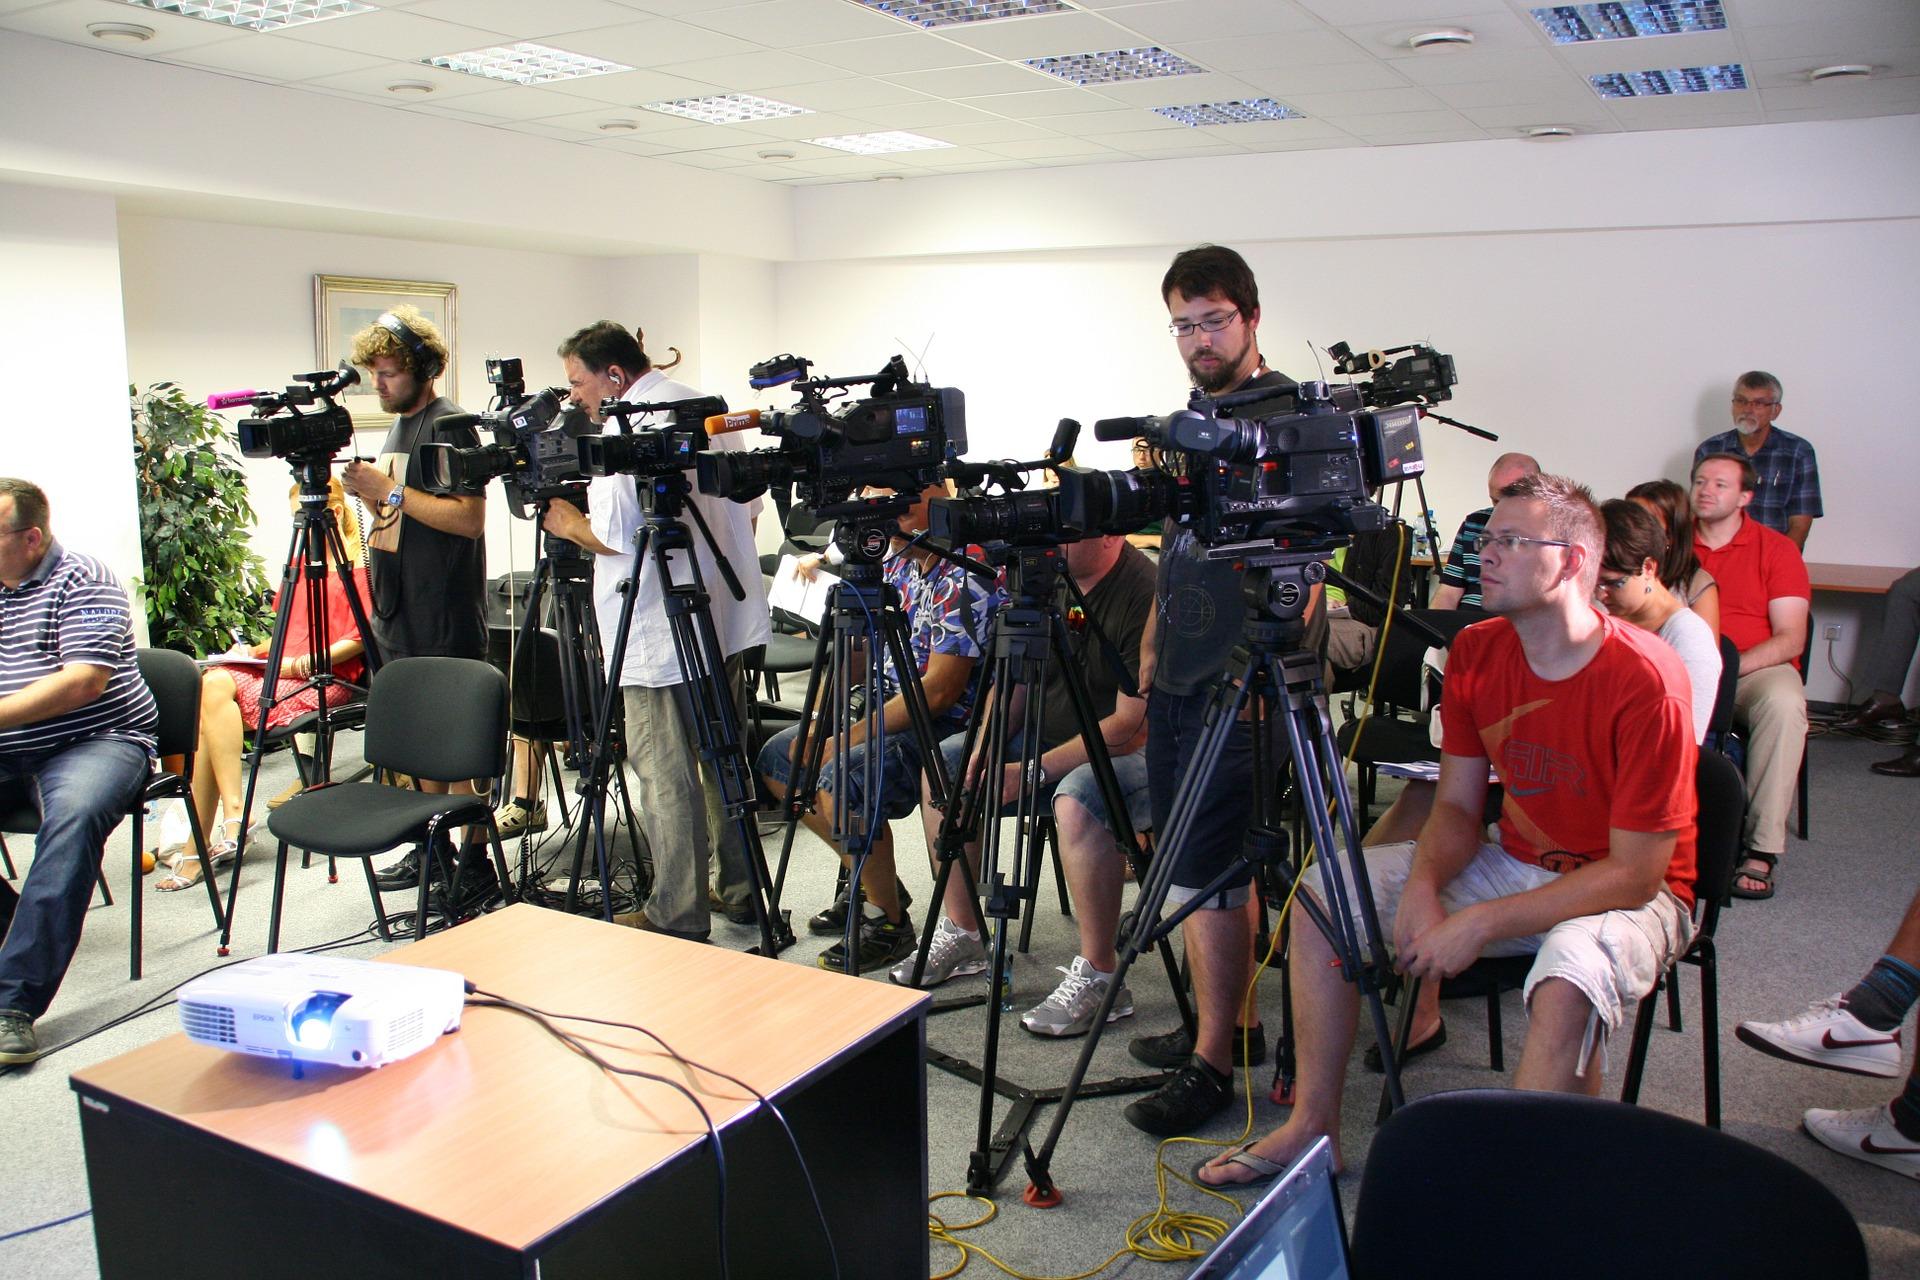 press-conference-1166343_1920.jpg